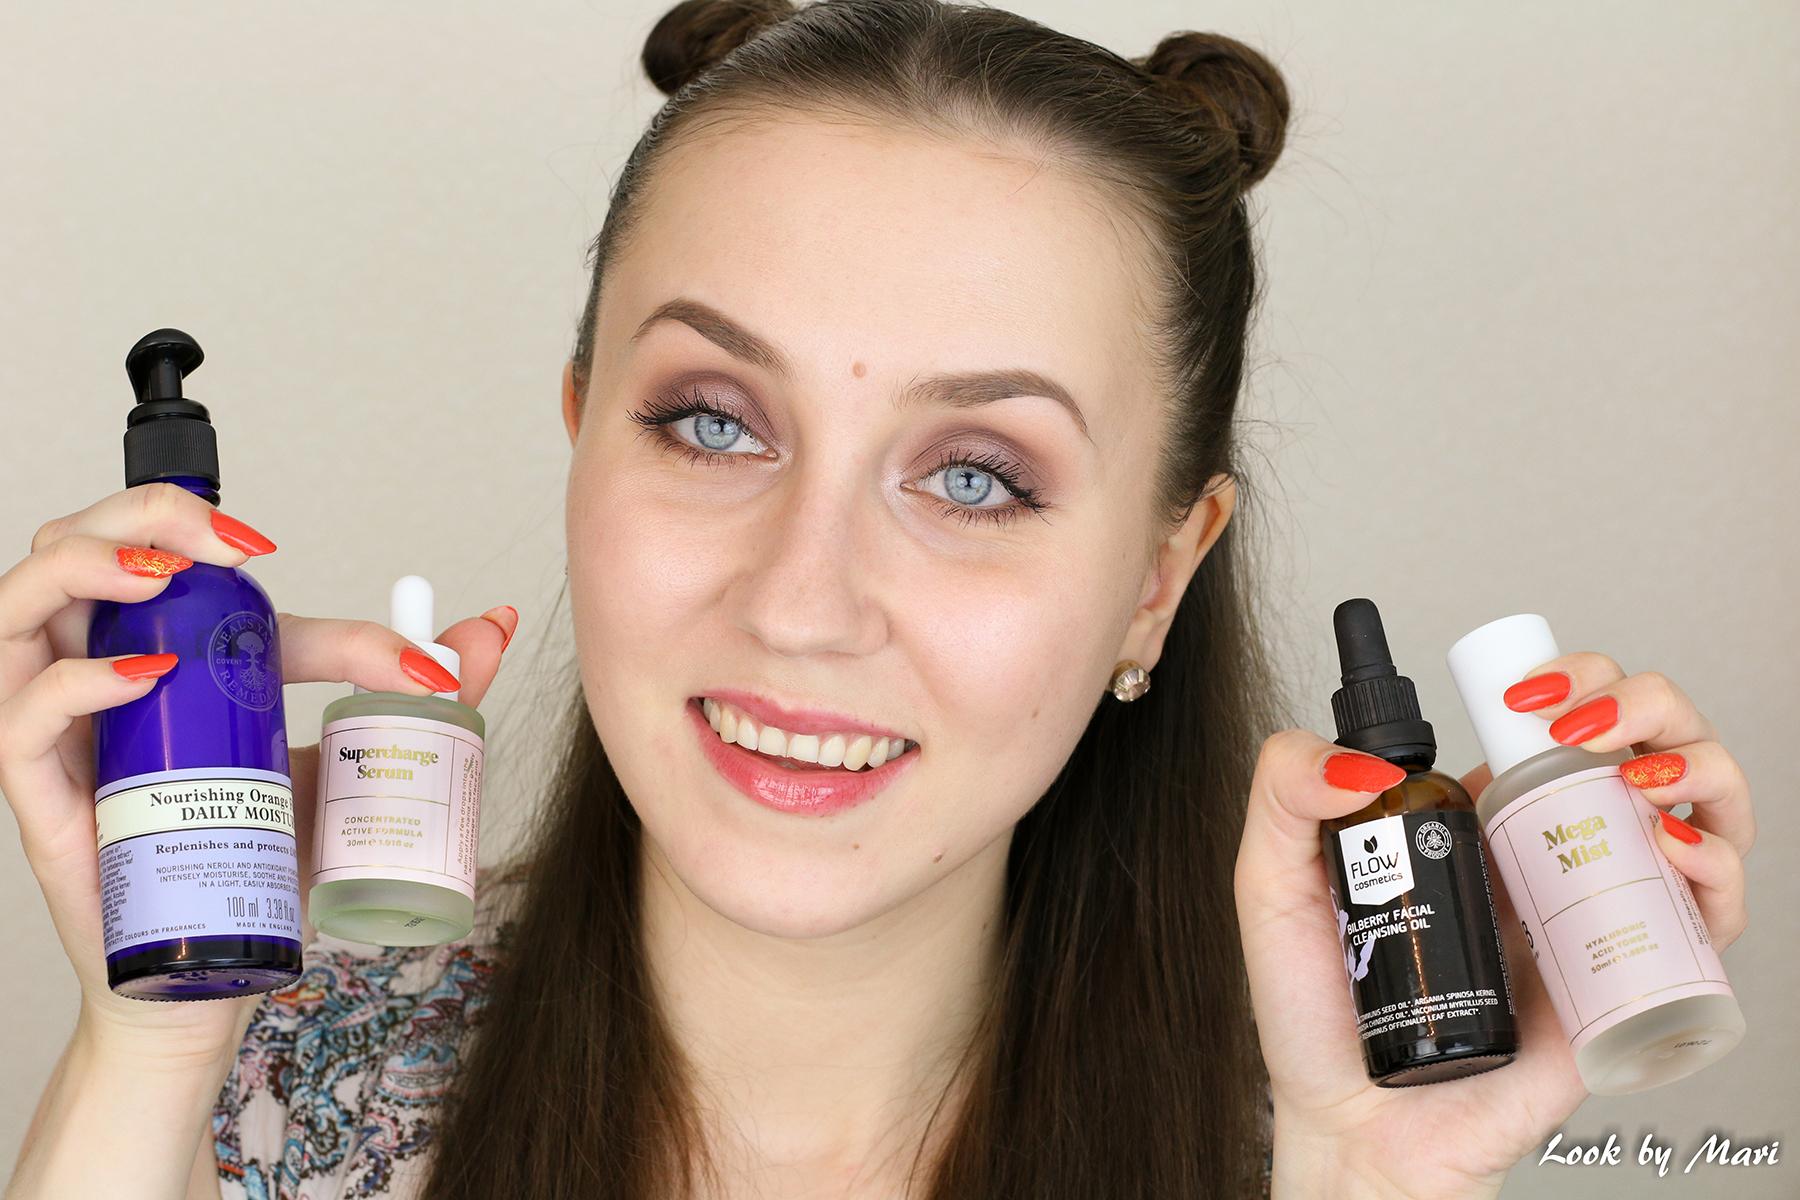 1 flow cosmetics cleansing oil bybi mega mist kokemuksia review